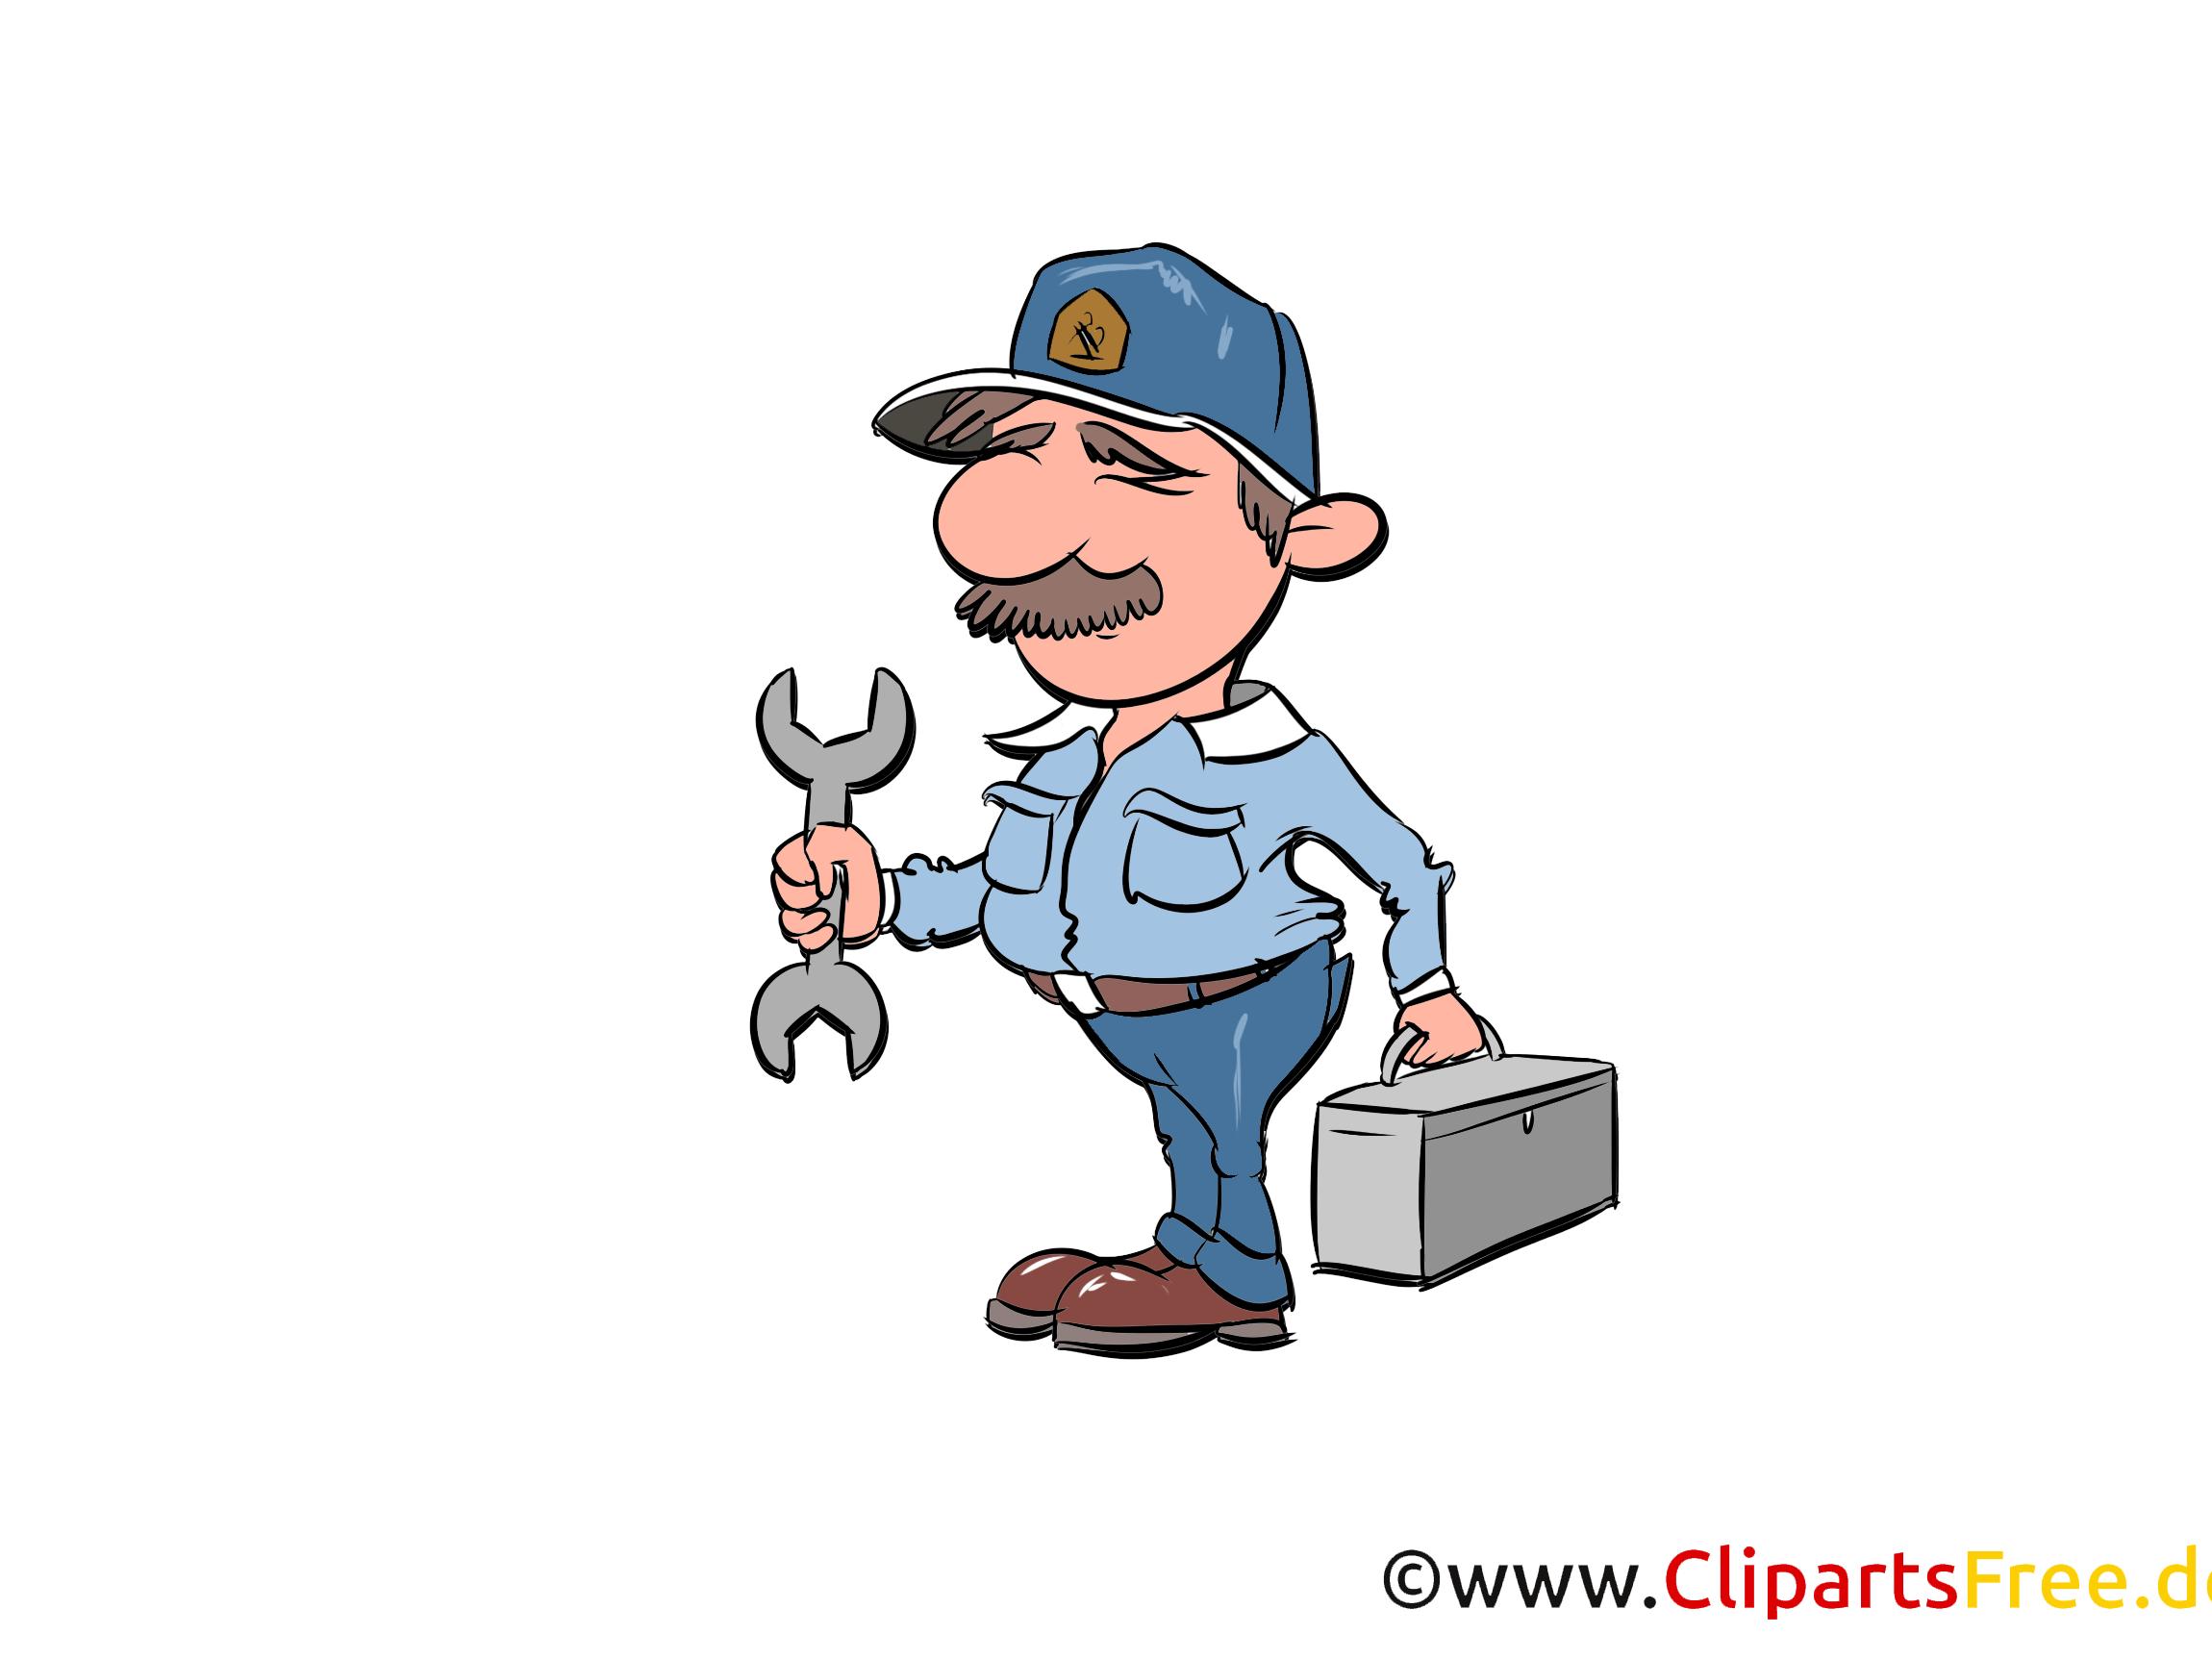 Werkstattmeister Bild, Illustration, Clipart, Cartoon gratis